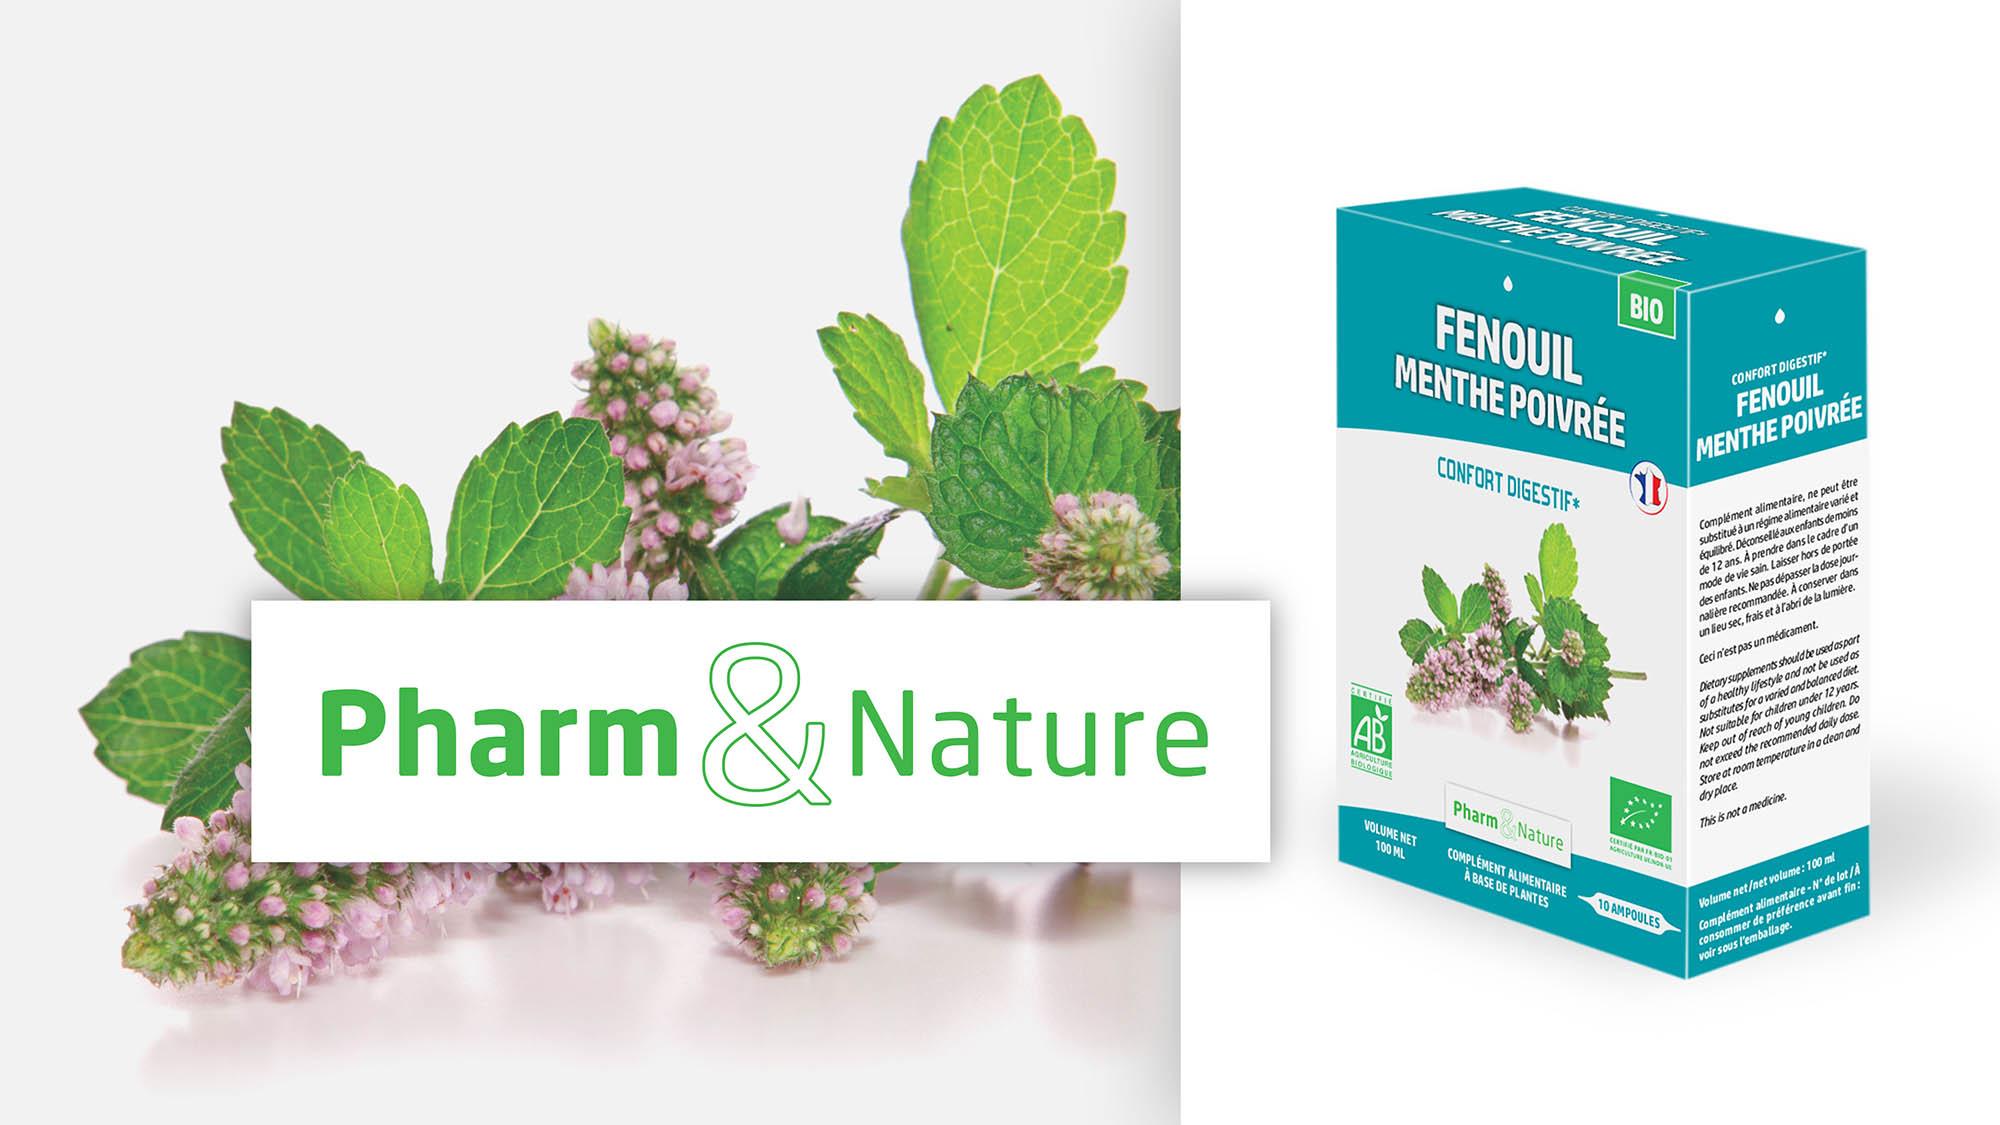 Pharm&Nature